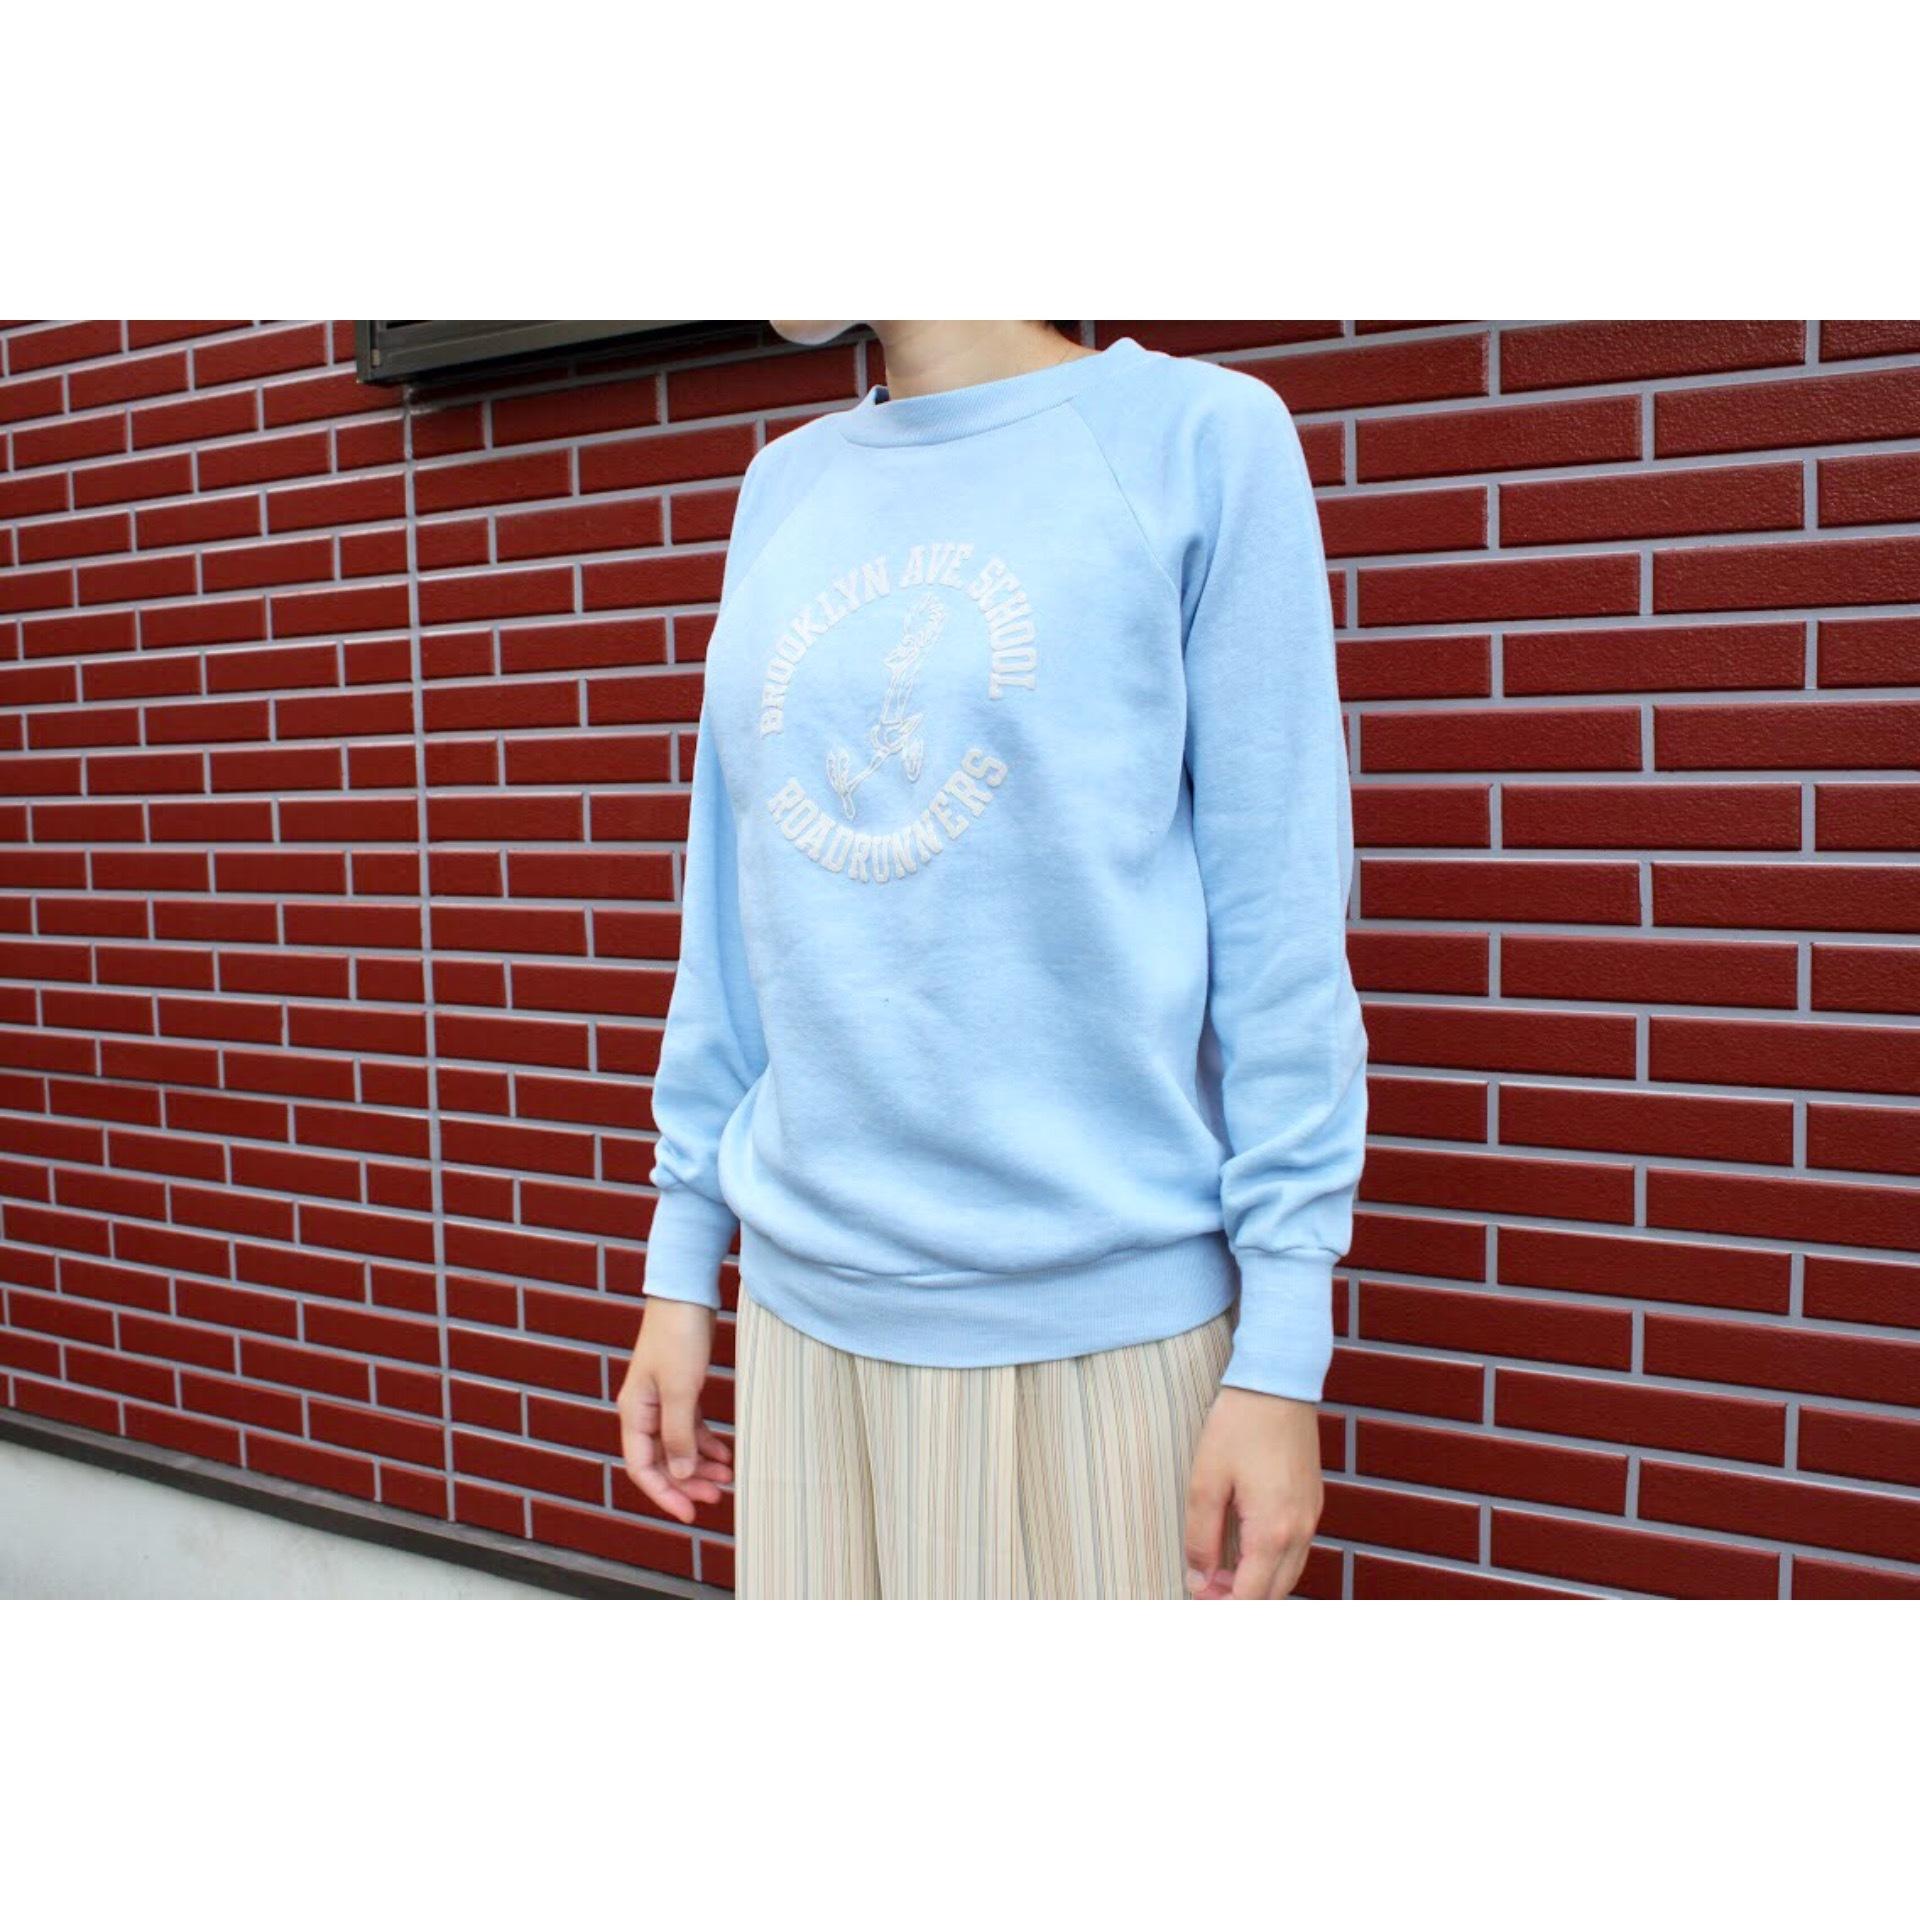 Vintage flock print sweater